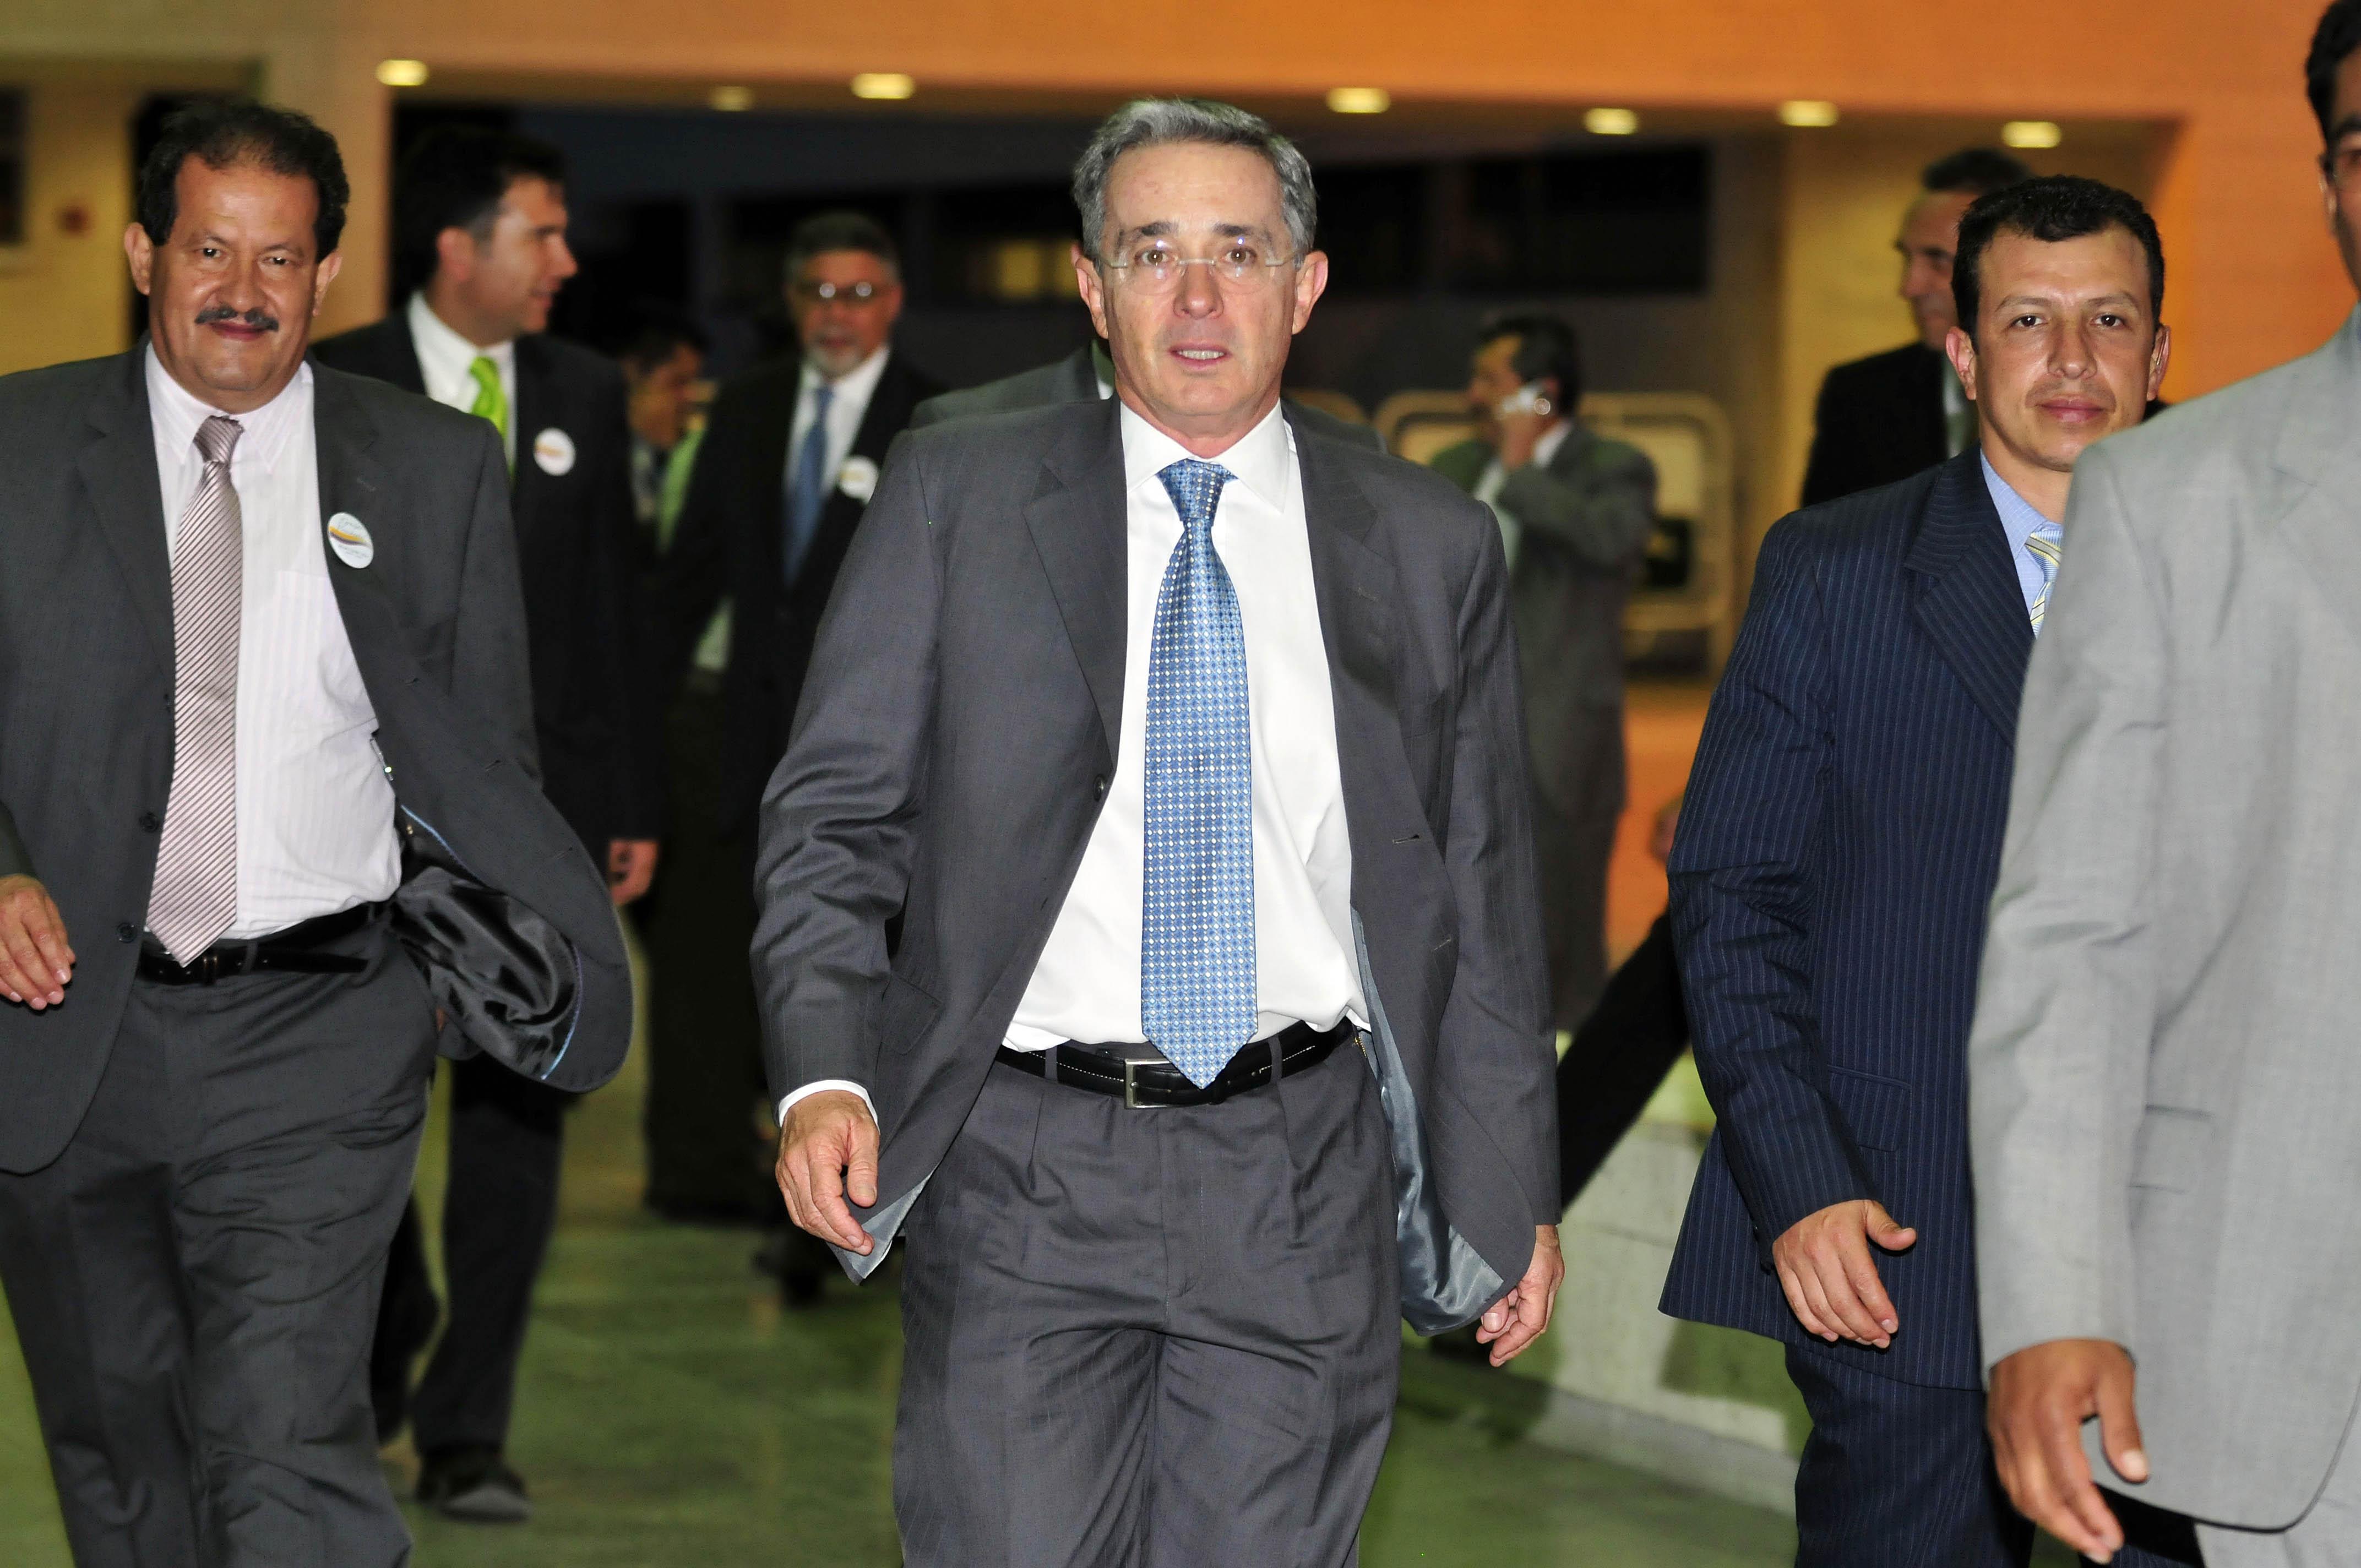 File:Álvaro Uribe Velez 57th President of Colombia.jpg - Wikimedia Commons